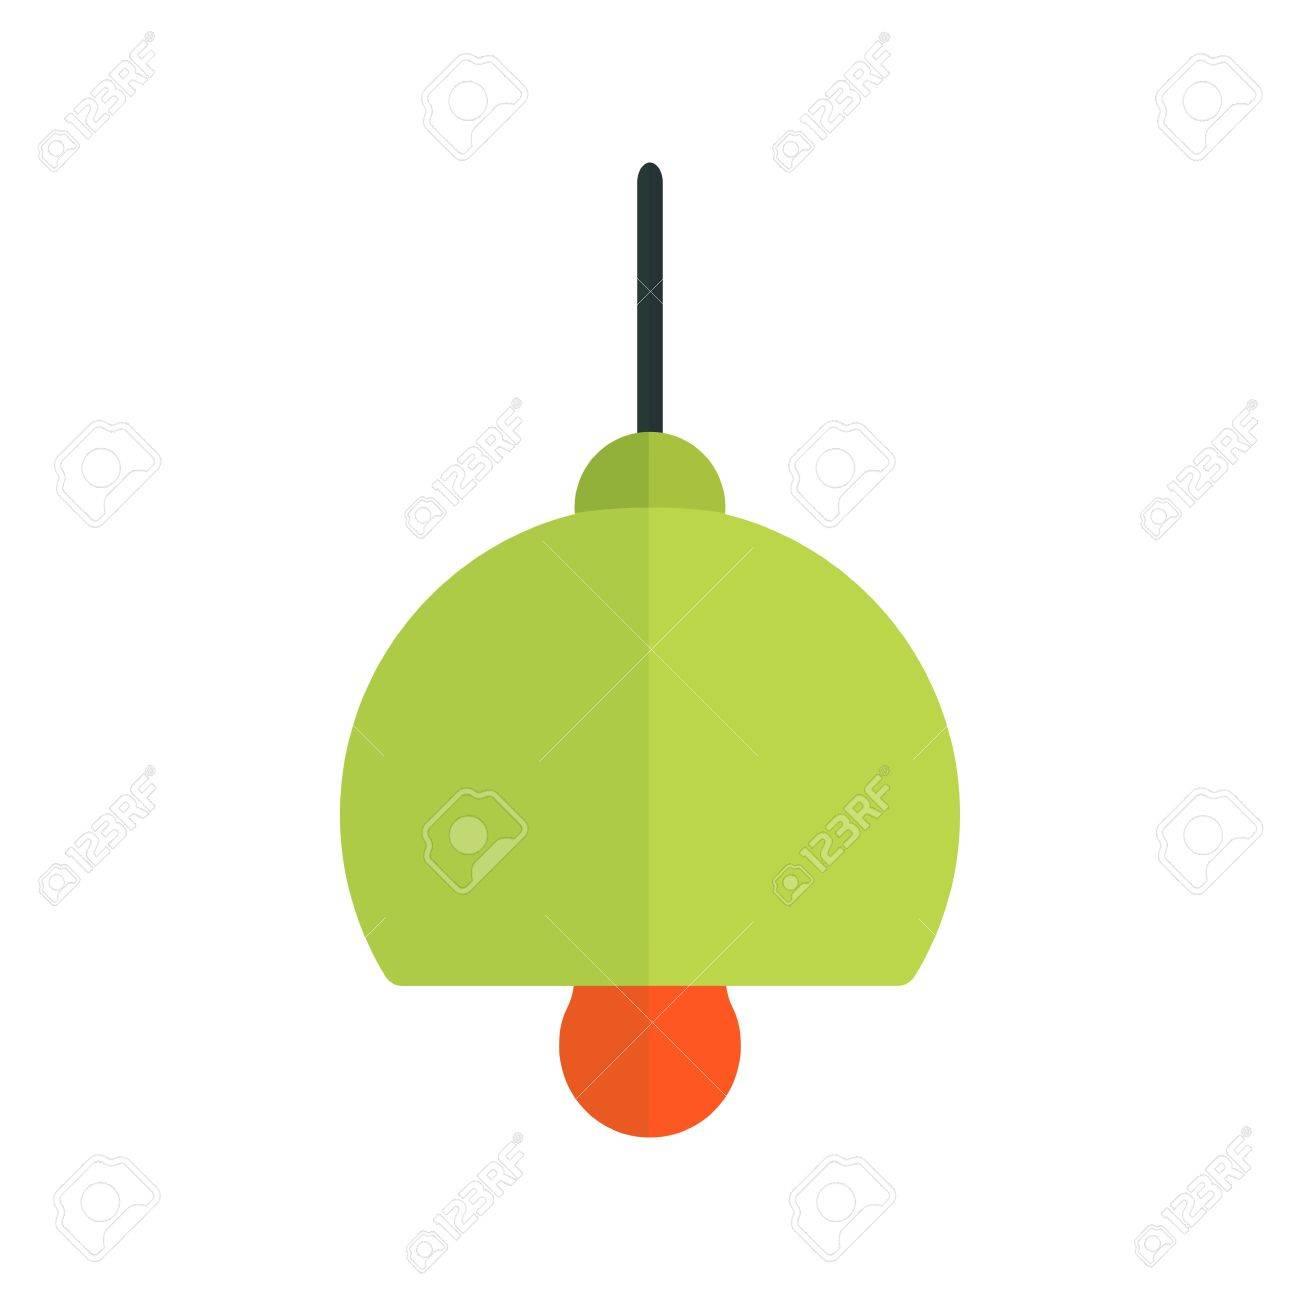 Decke Buro Beleuchtung Symbol Vektor Image Can Auch Fur Hotel Und